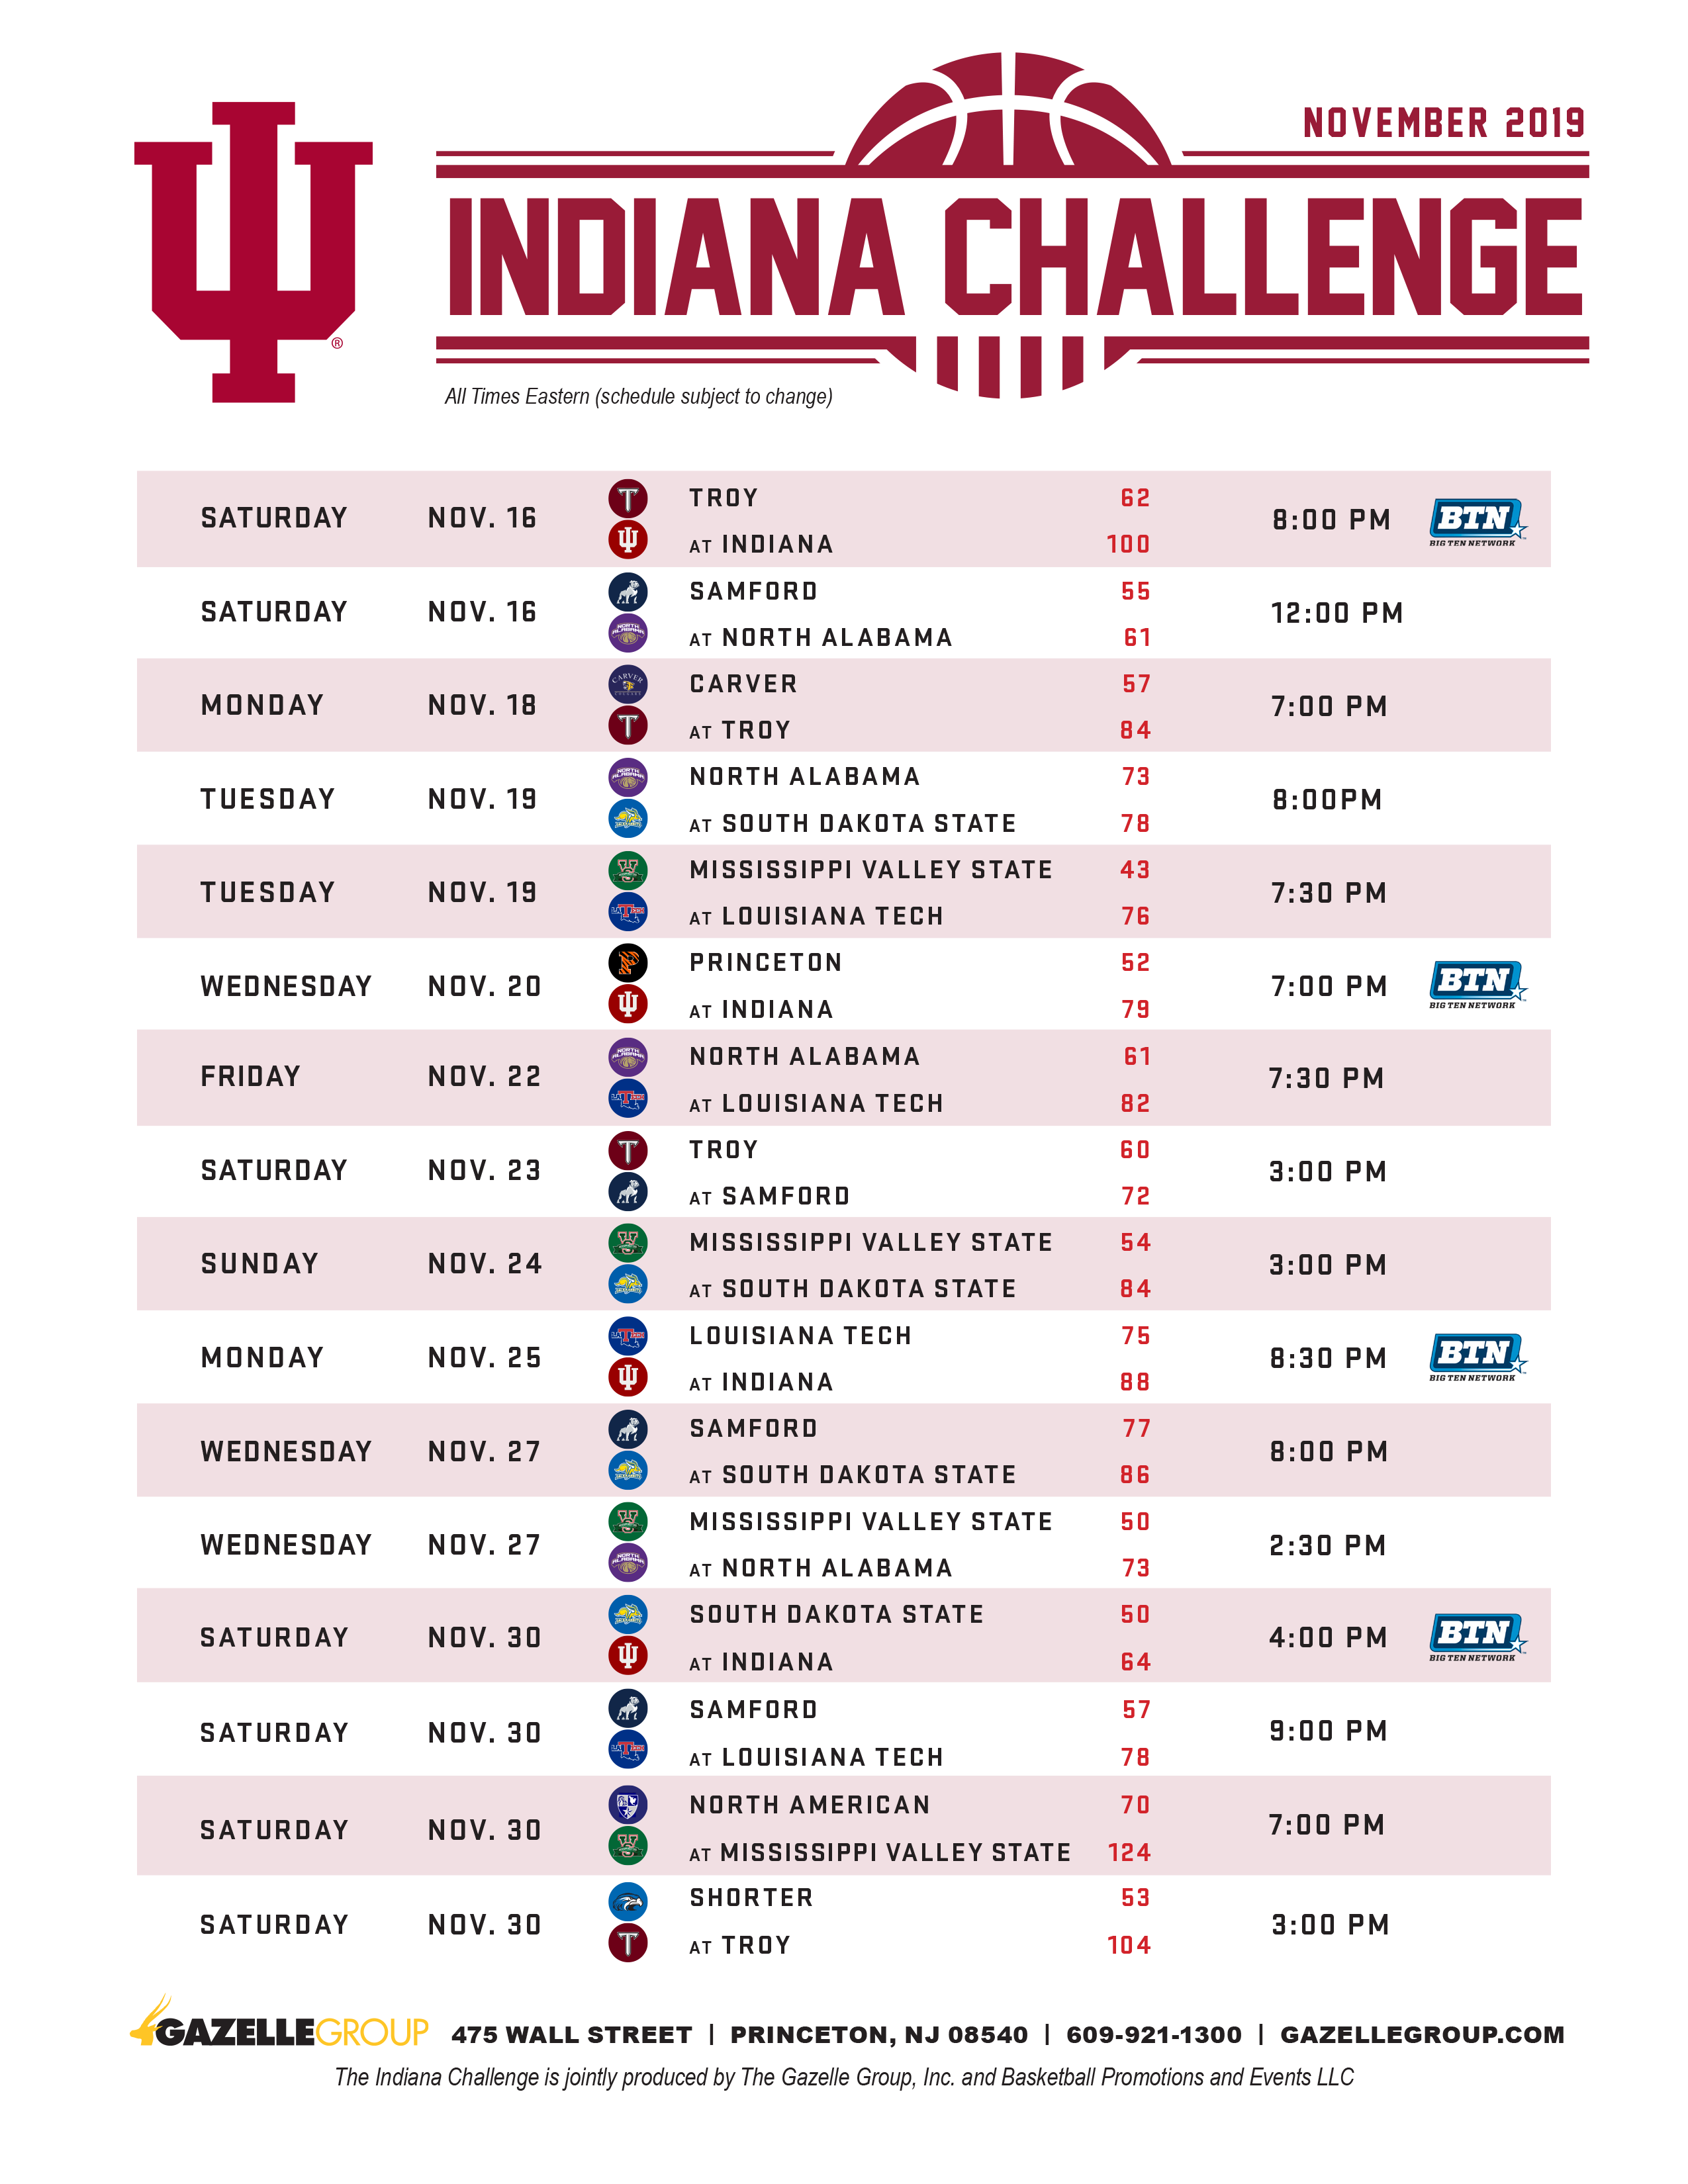 Indiana Challenge Schedule